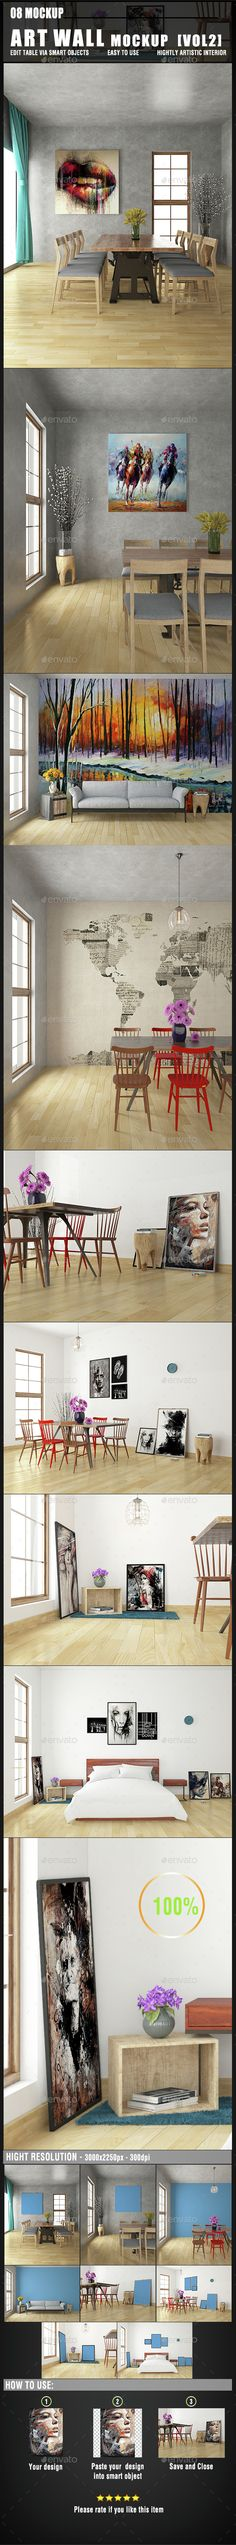 Art Wall Mockup. Download here: http://graphicriver.net/item/art-wall-mockup-vol2/15232914?ref=ksioks